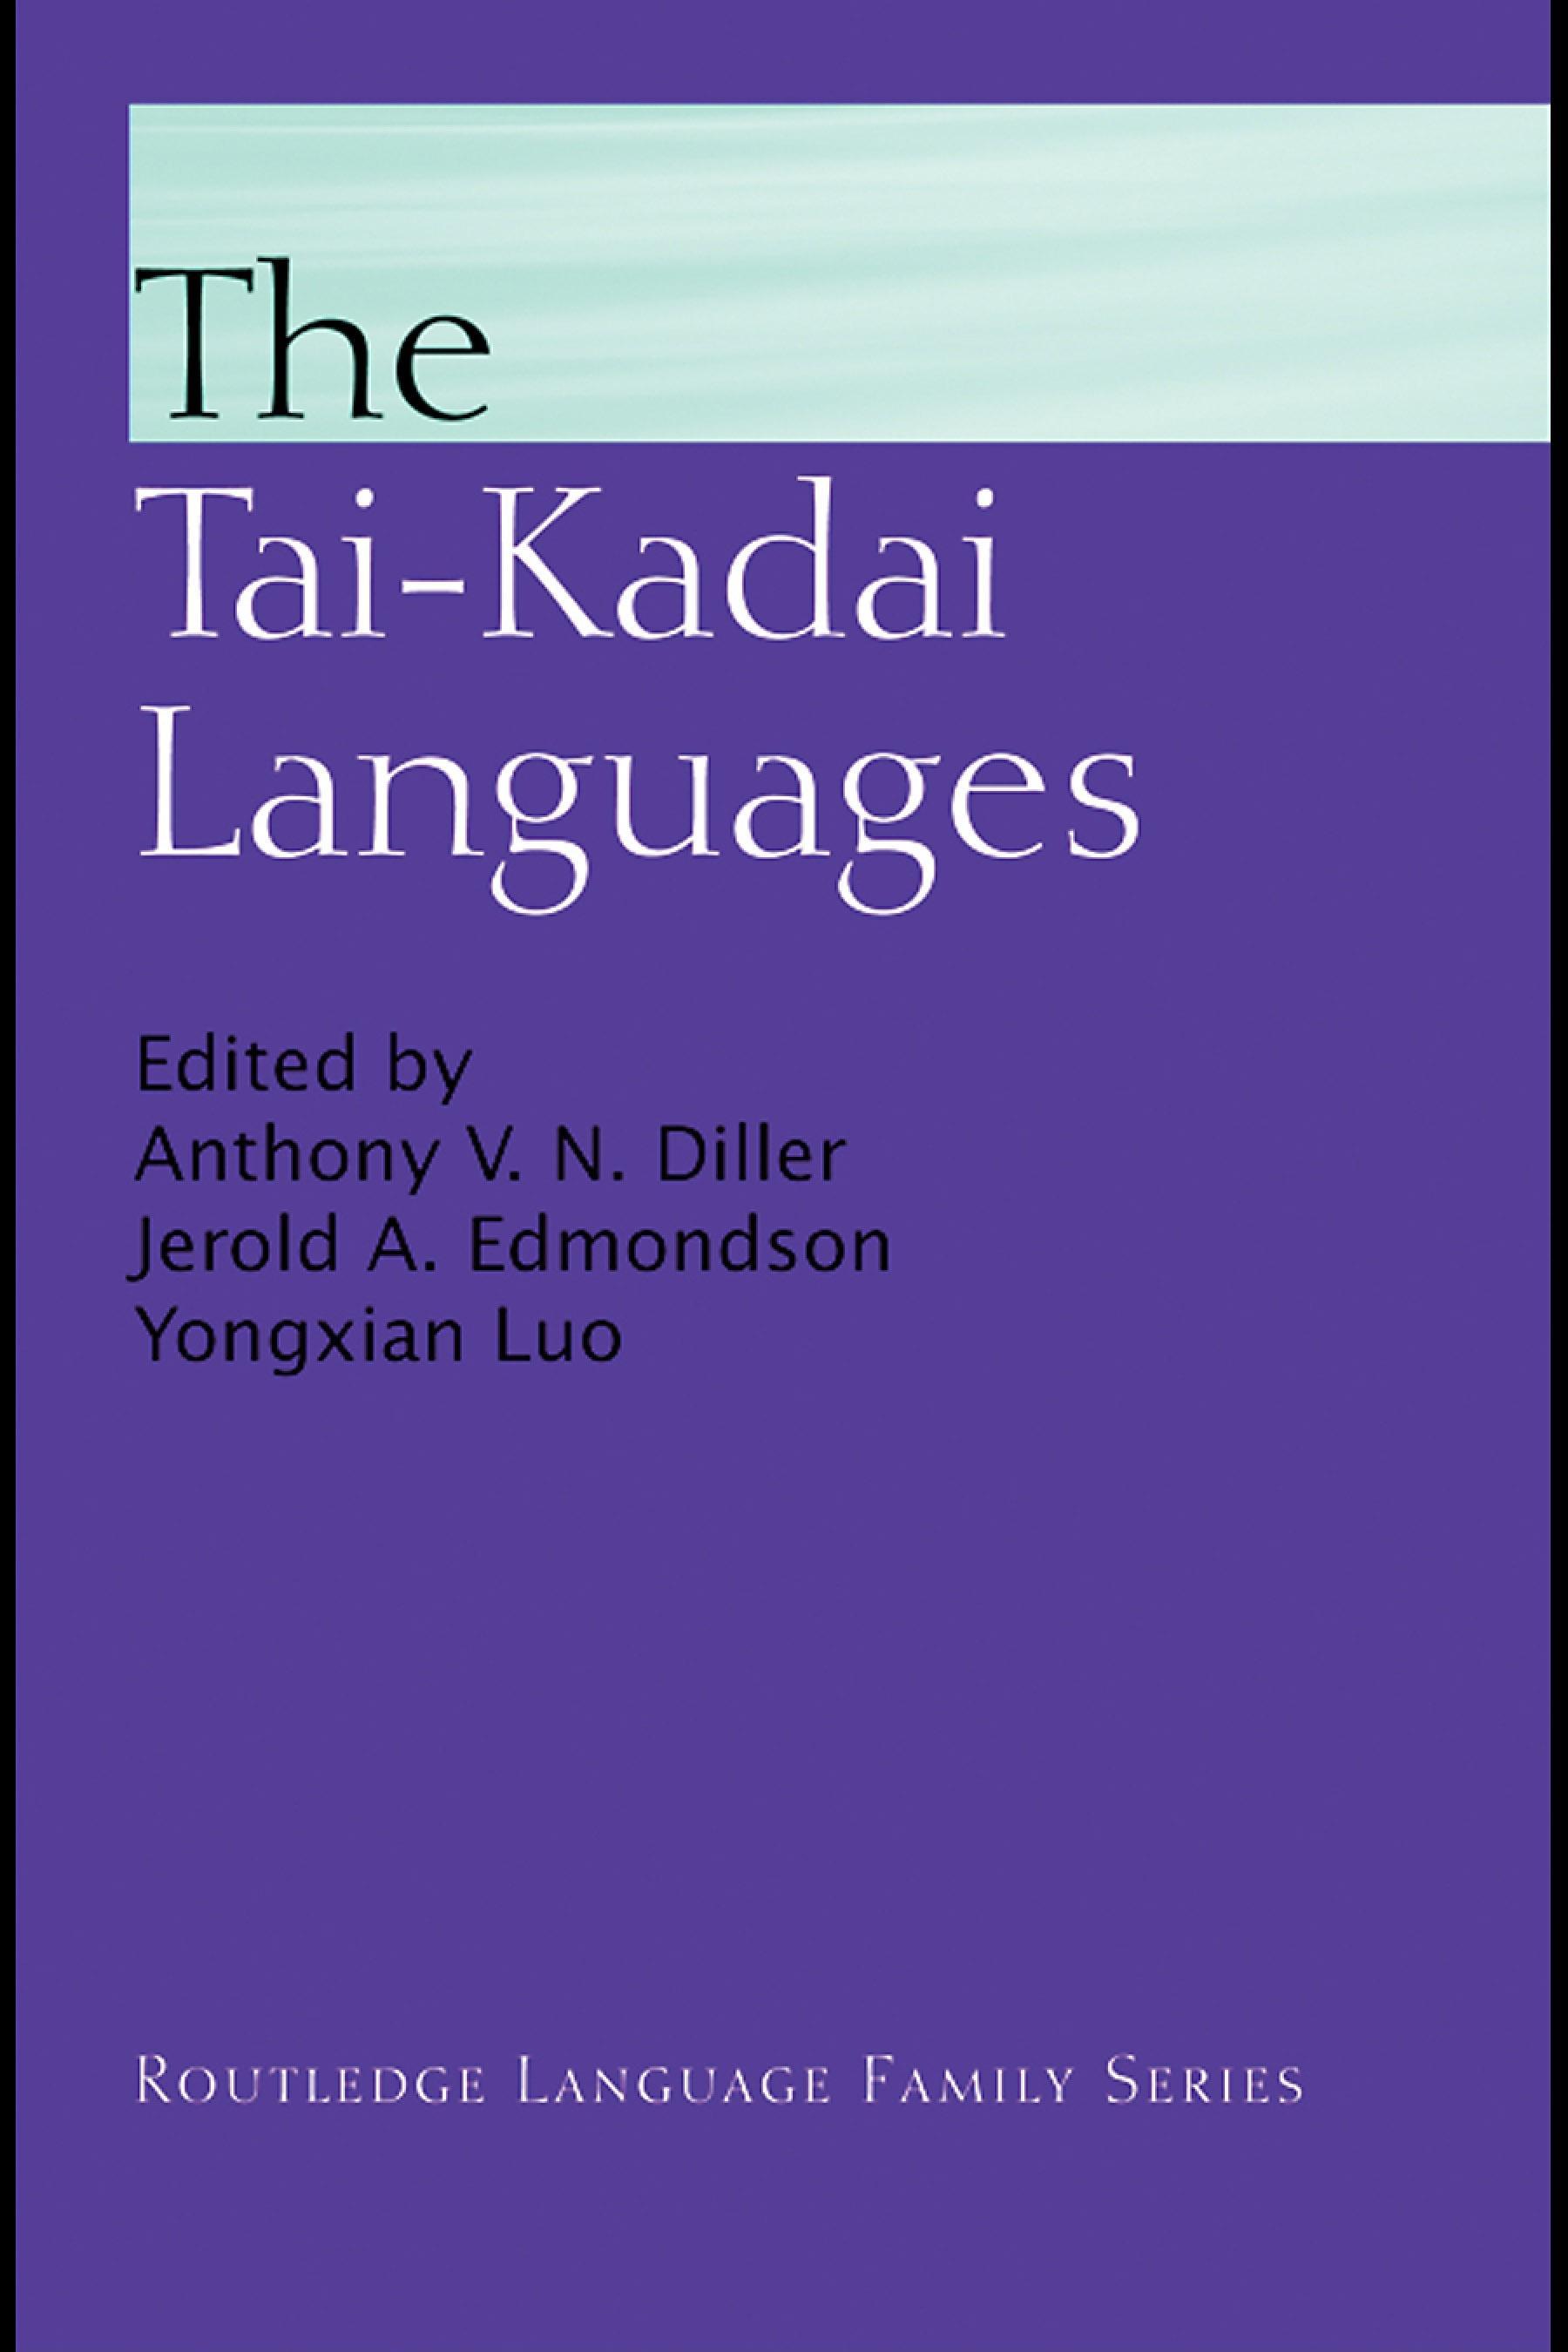 The Tai-Kadai Languages EB9780203641873